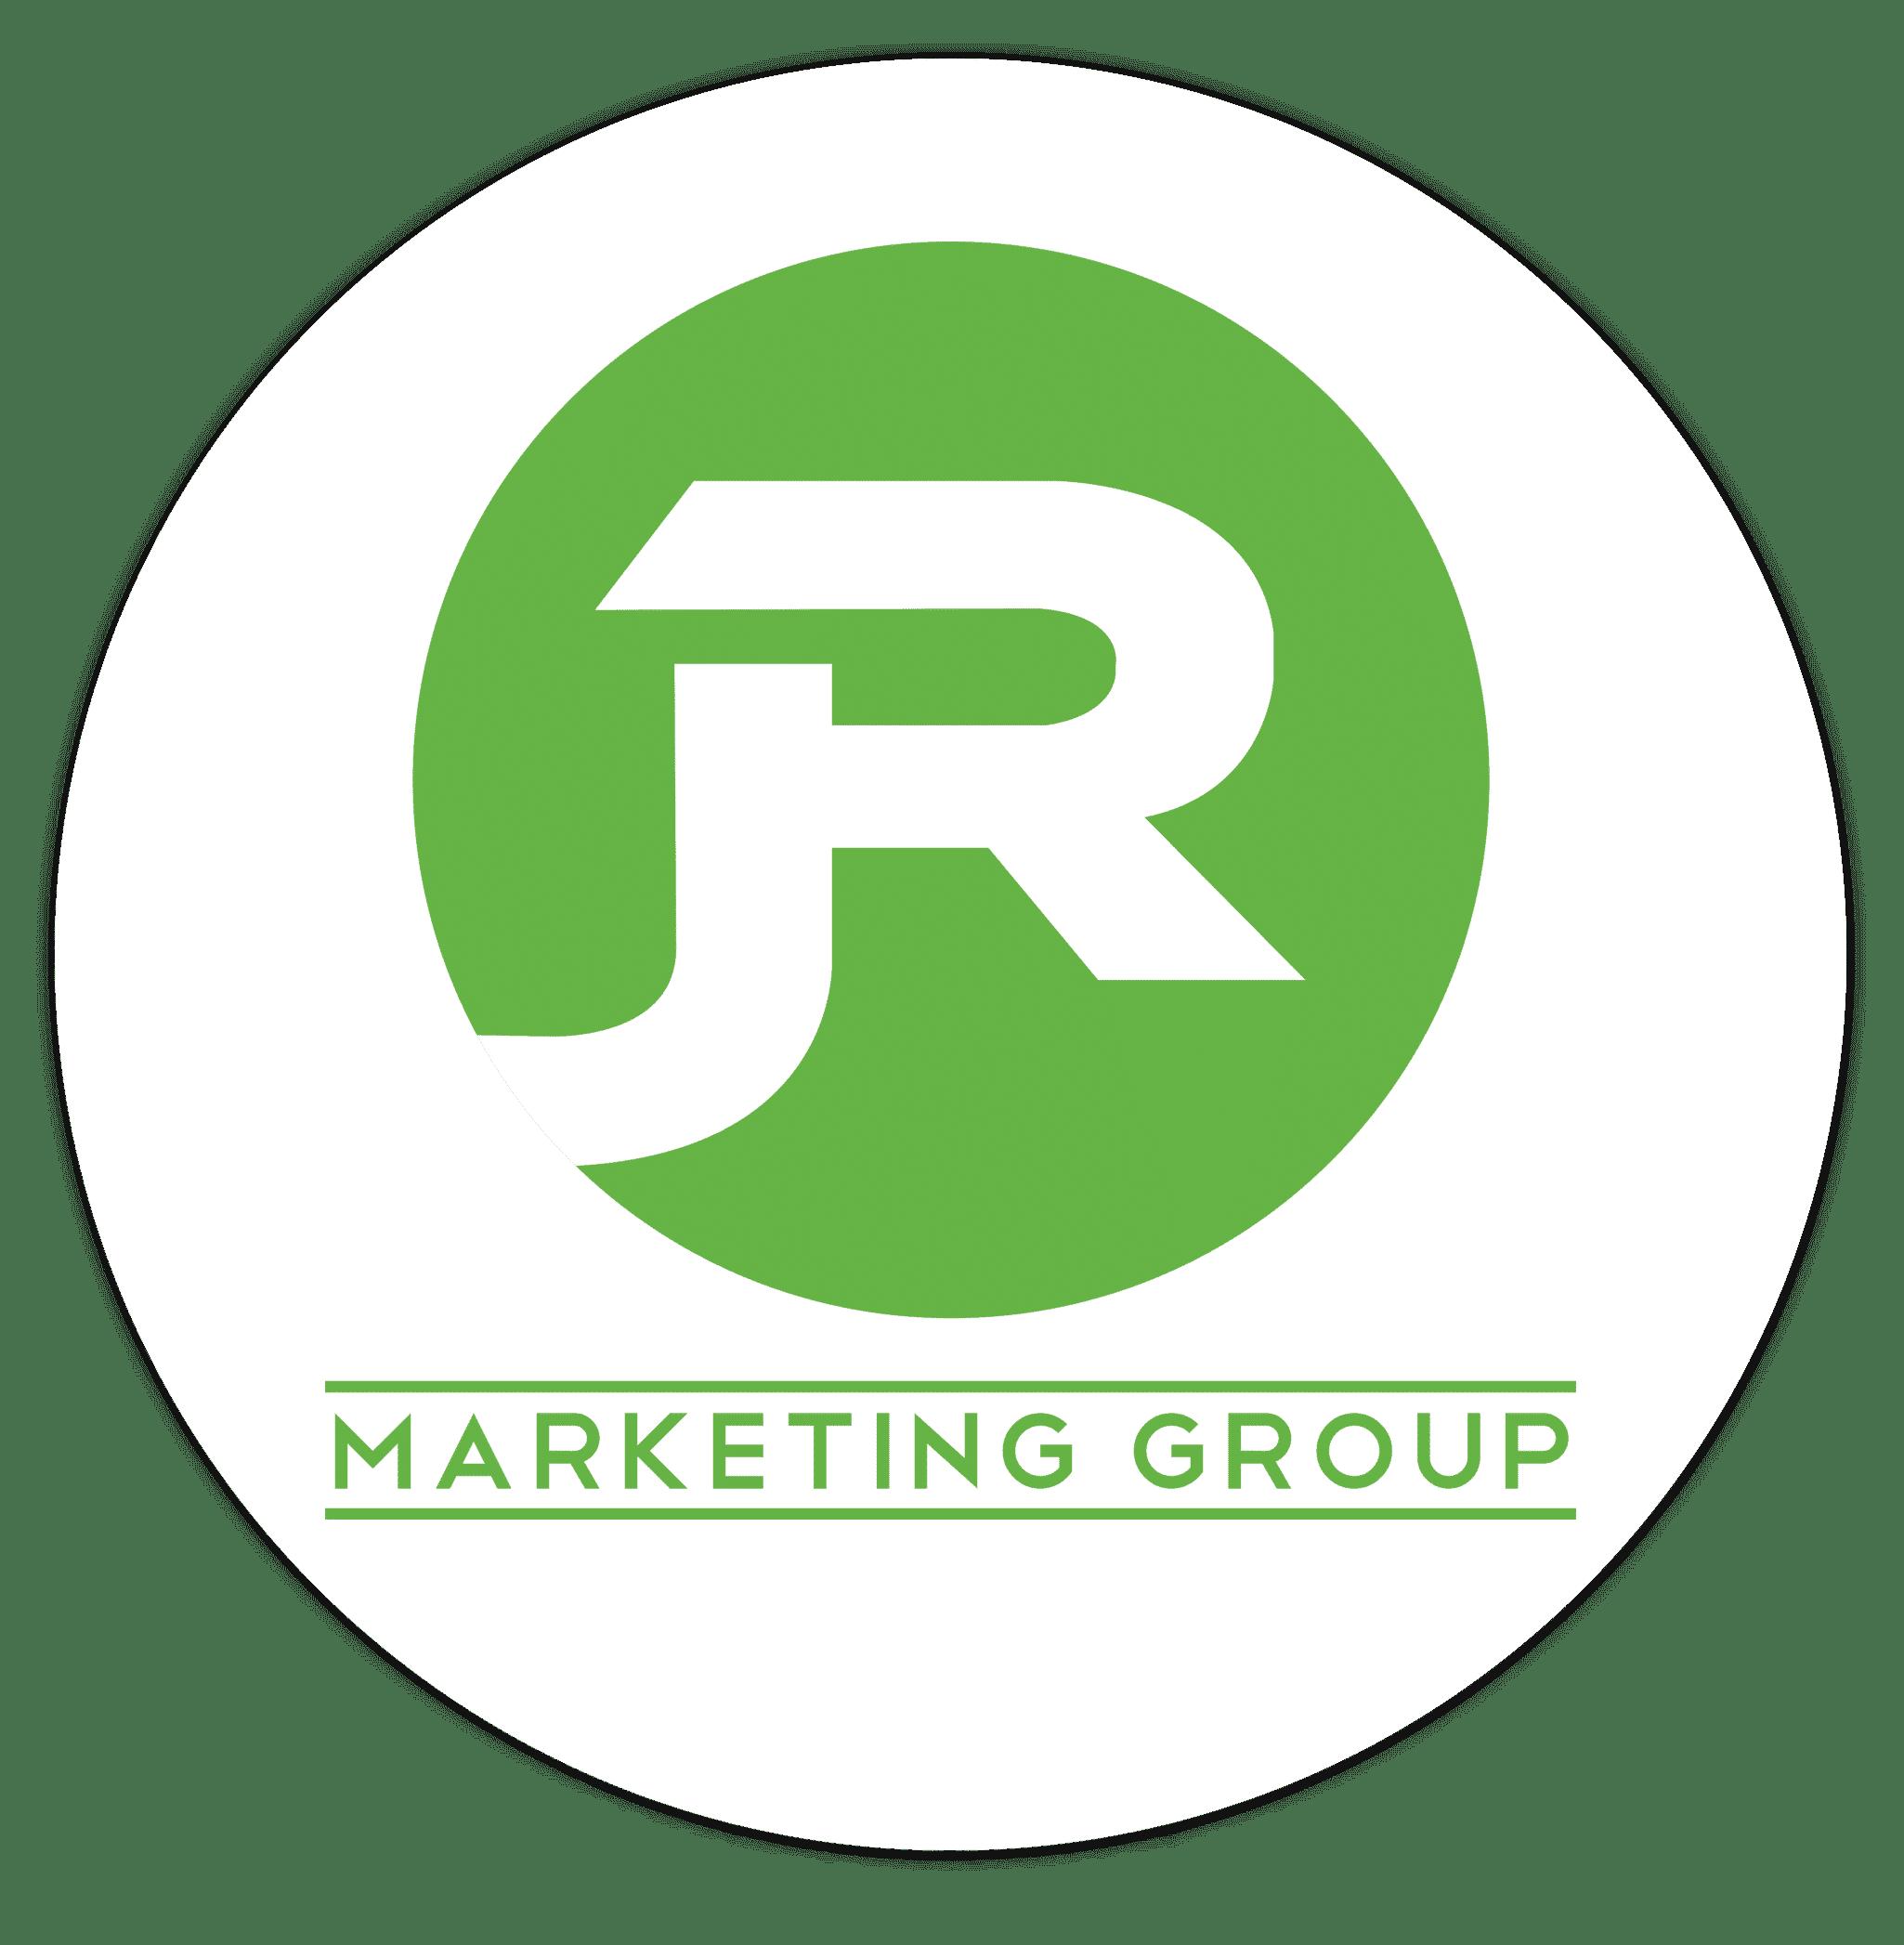 JR Marketing Group